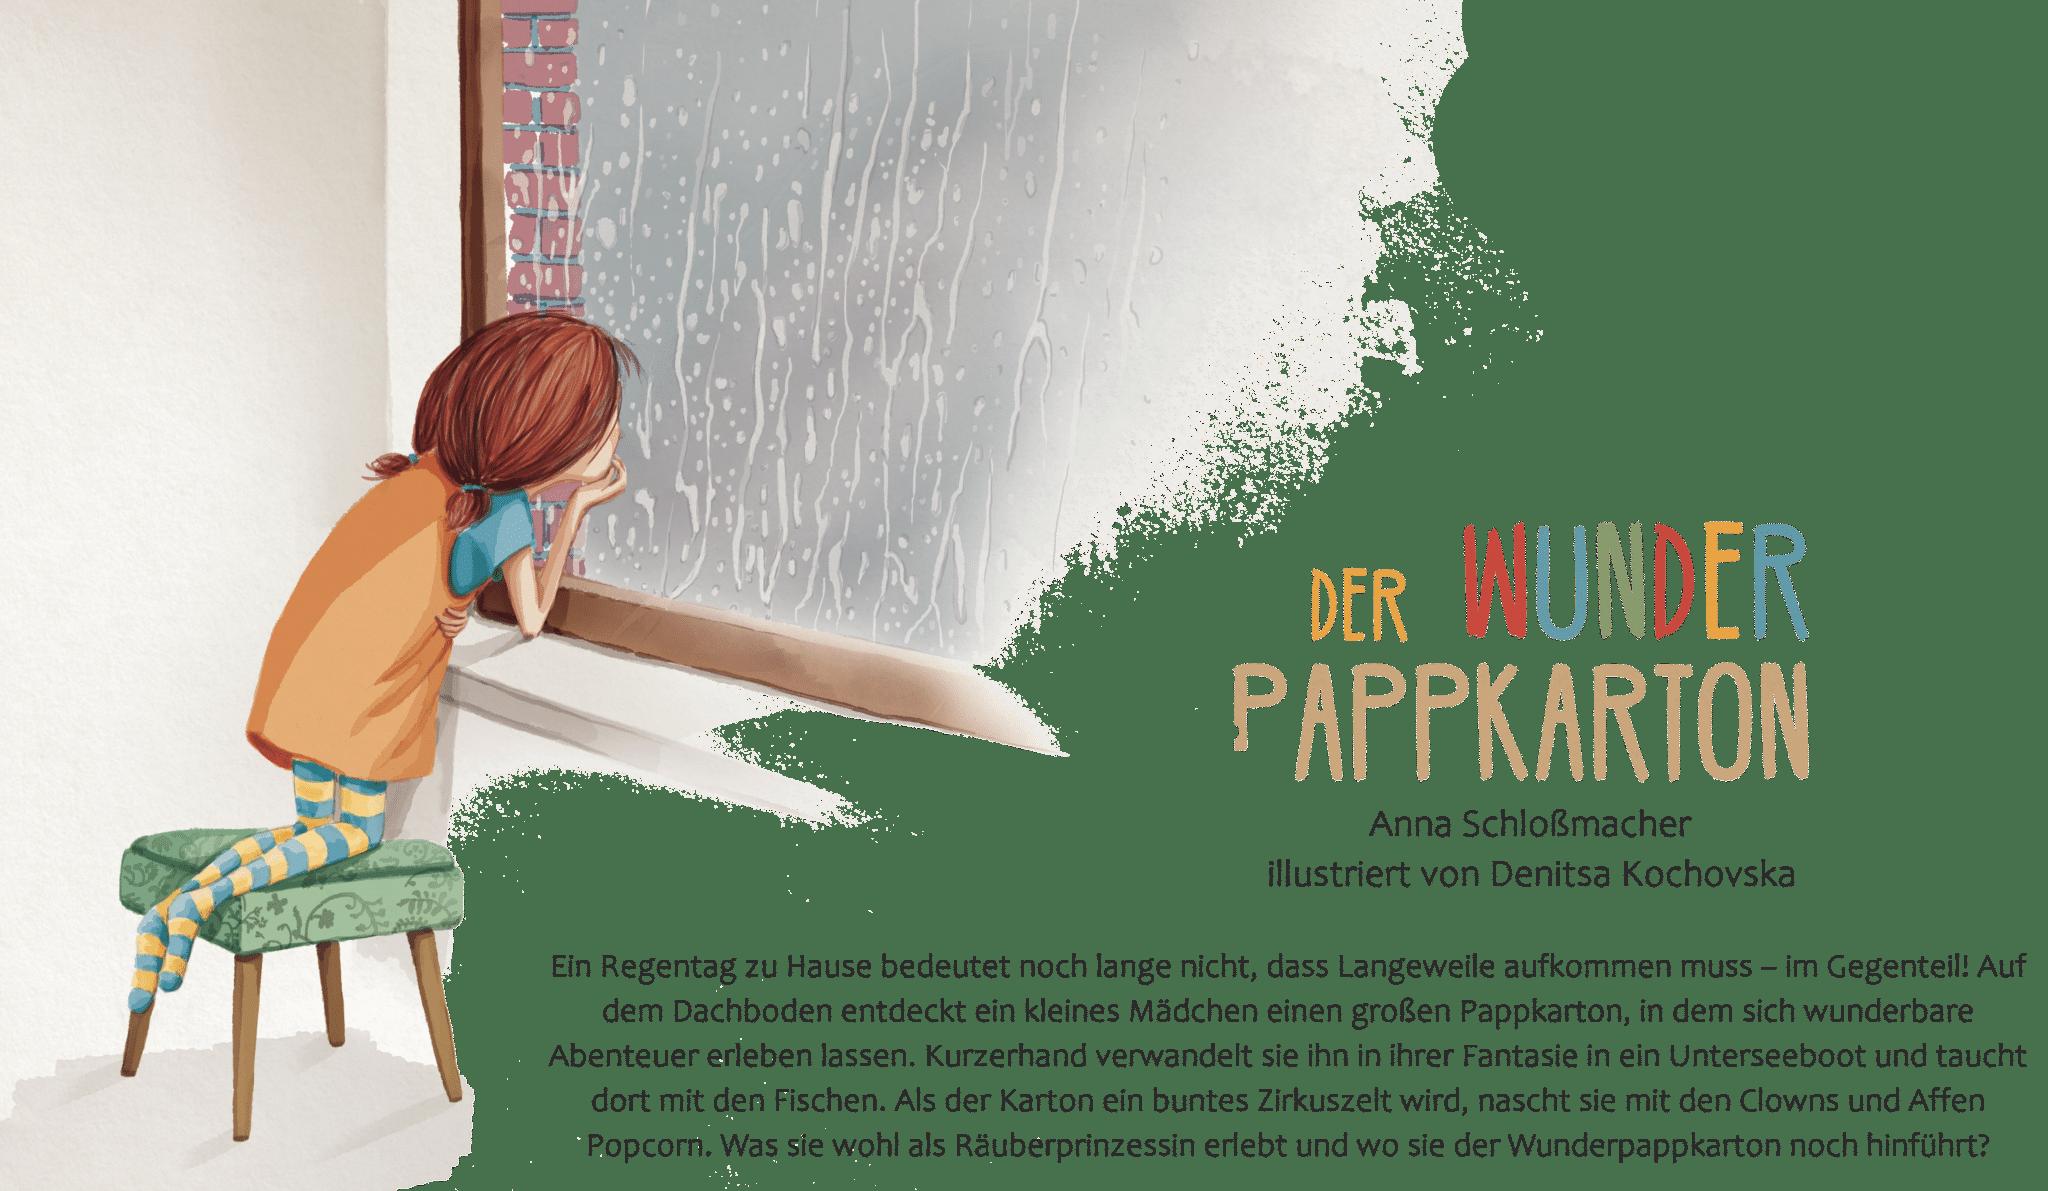 Peckelston Kinderbuchverlag Der wunderpappkarton denitsa kochovska Anna schloßmacher